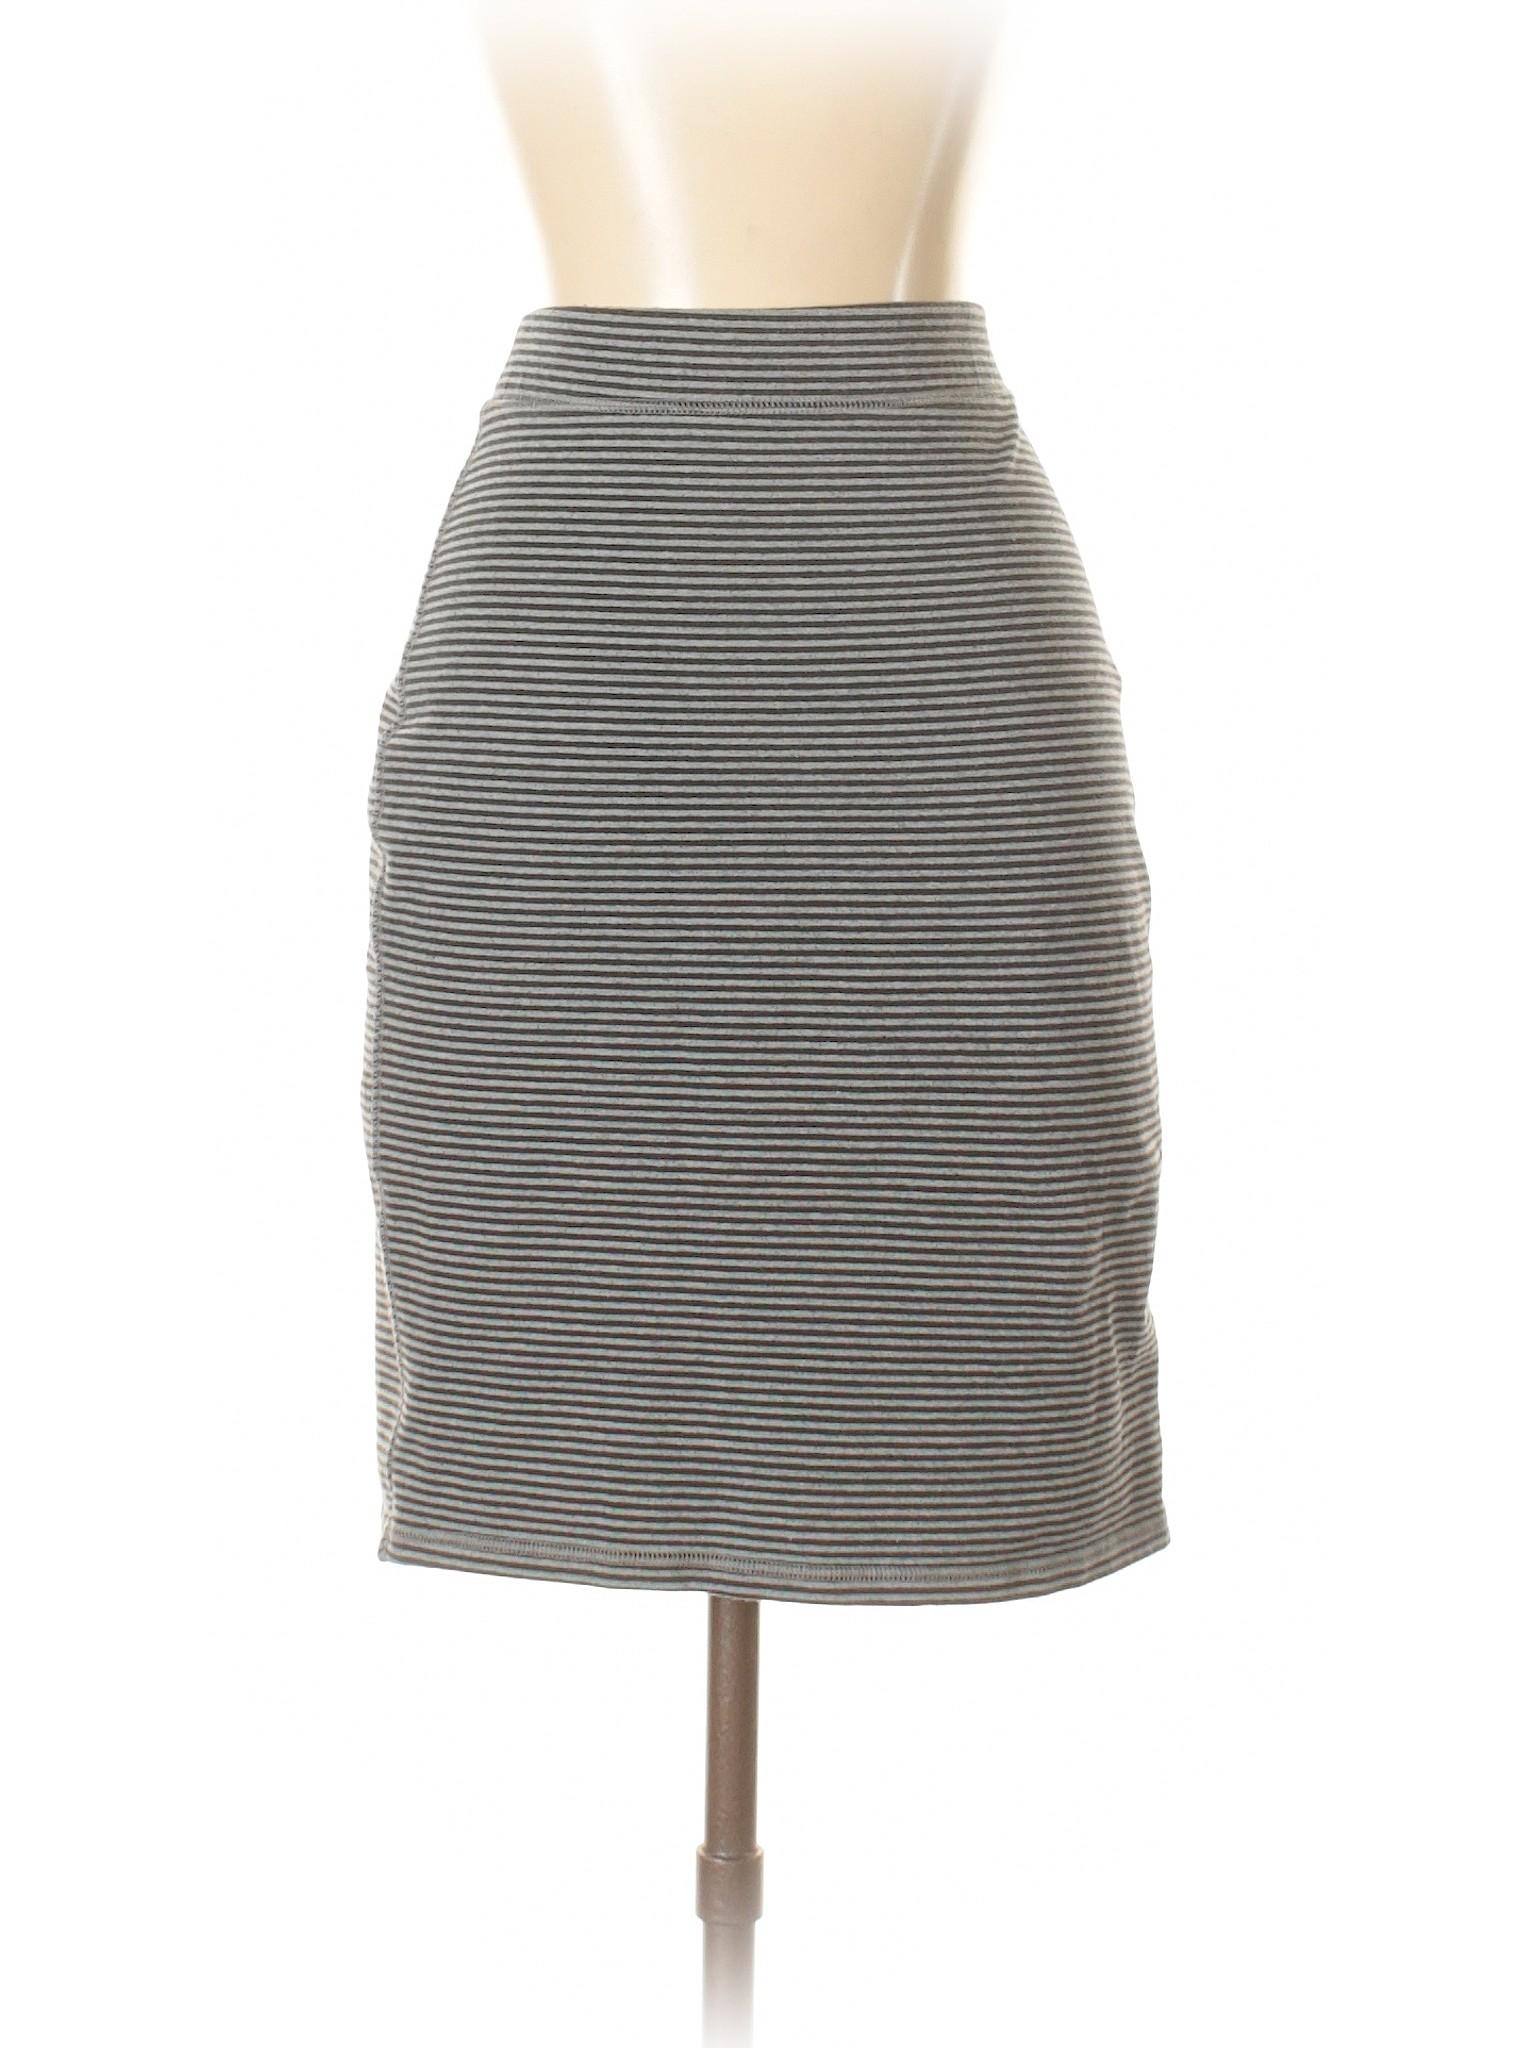 Casual Casual Boutique Boutique Boutique Skirt Casual Skirt Skirt Skirt Boutique Skirt Casual Casual Skirt Boutique Boutique Casual Boutique 47AWqH